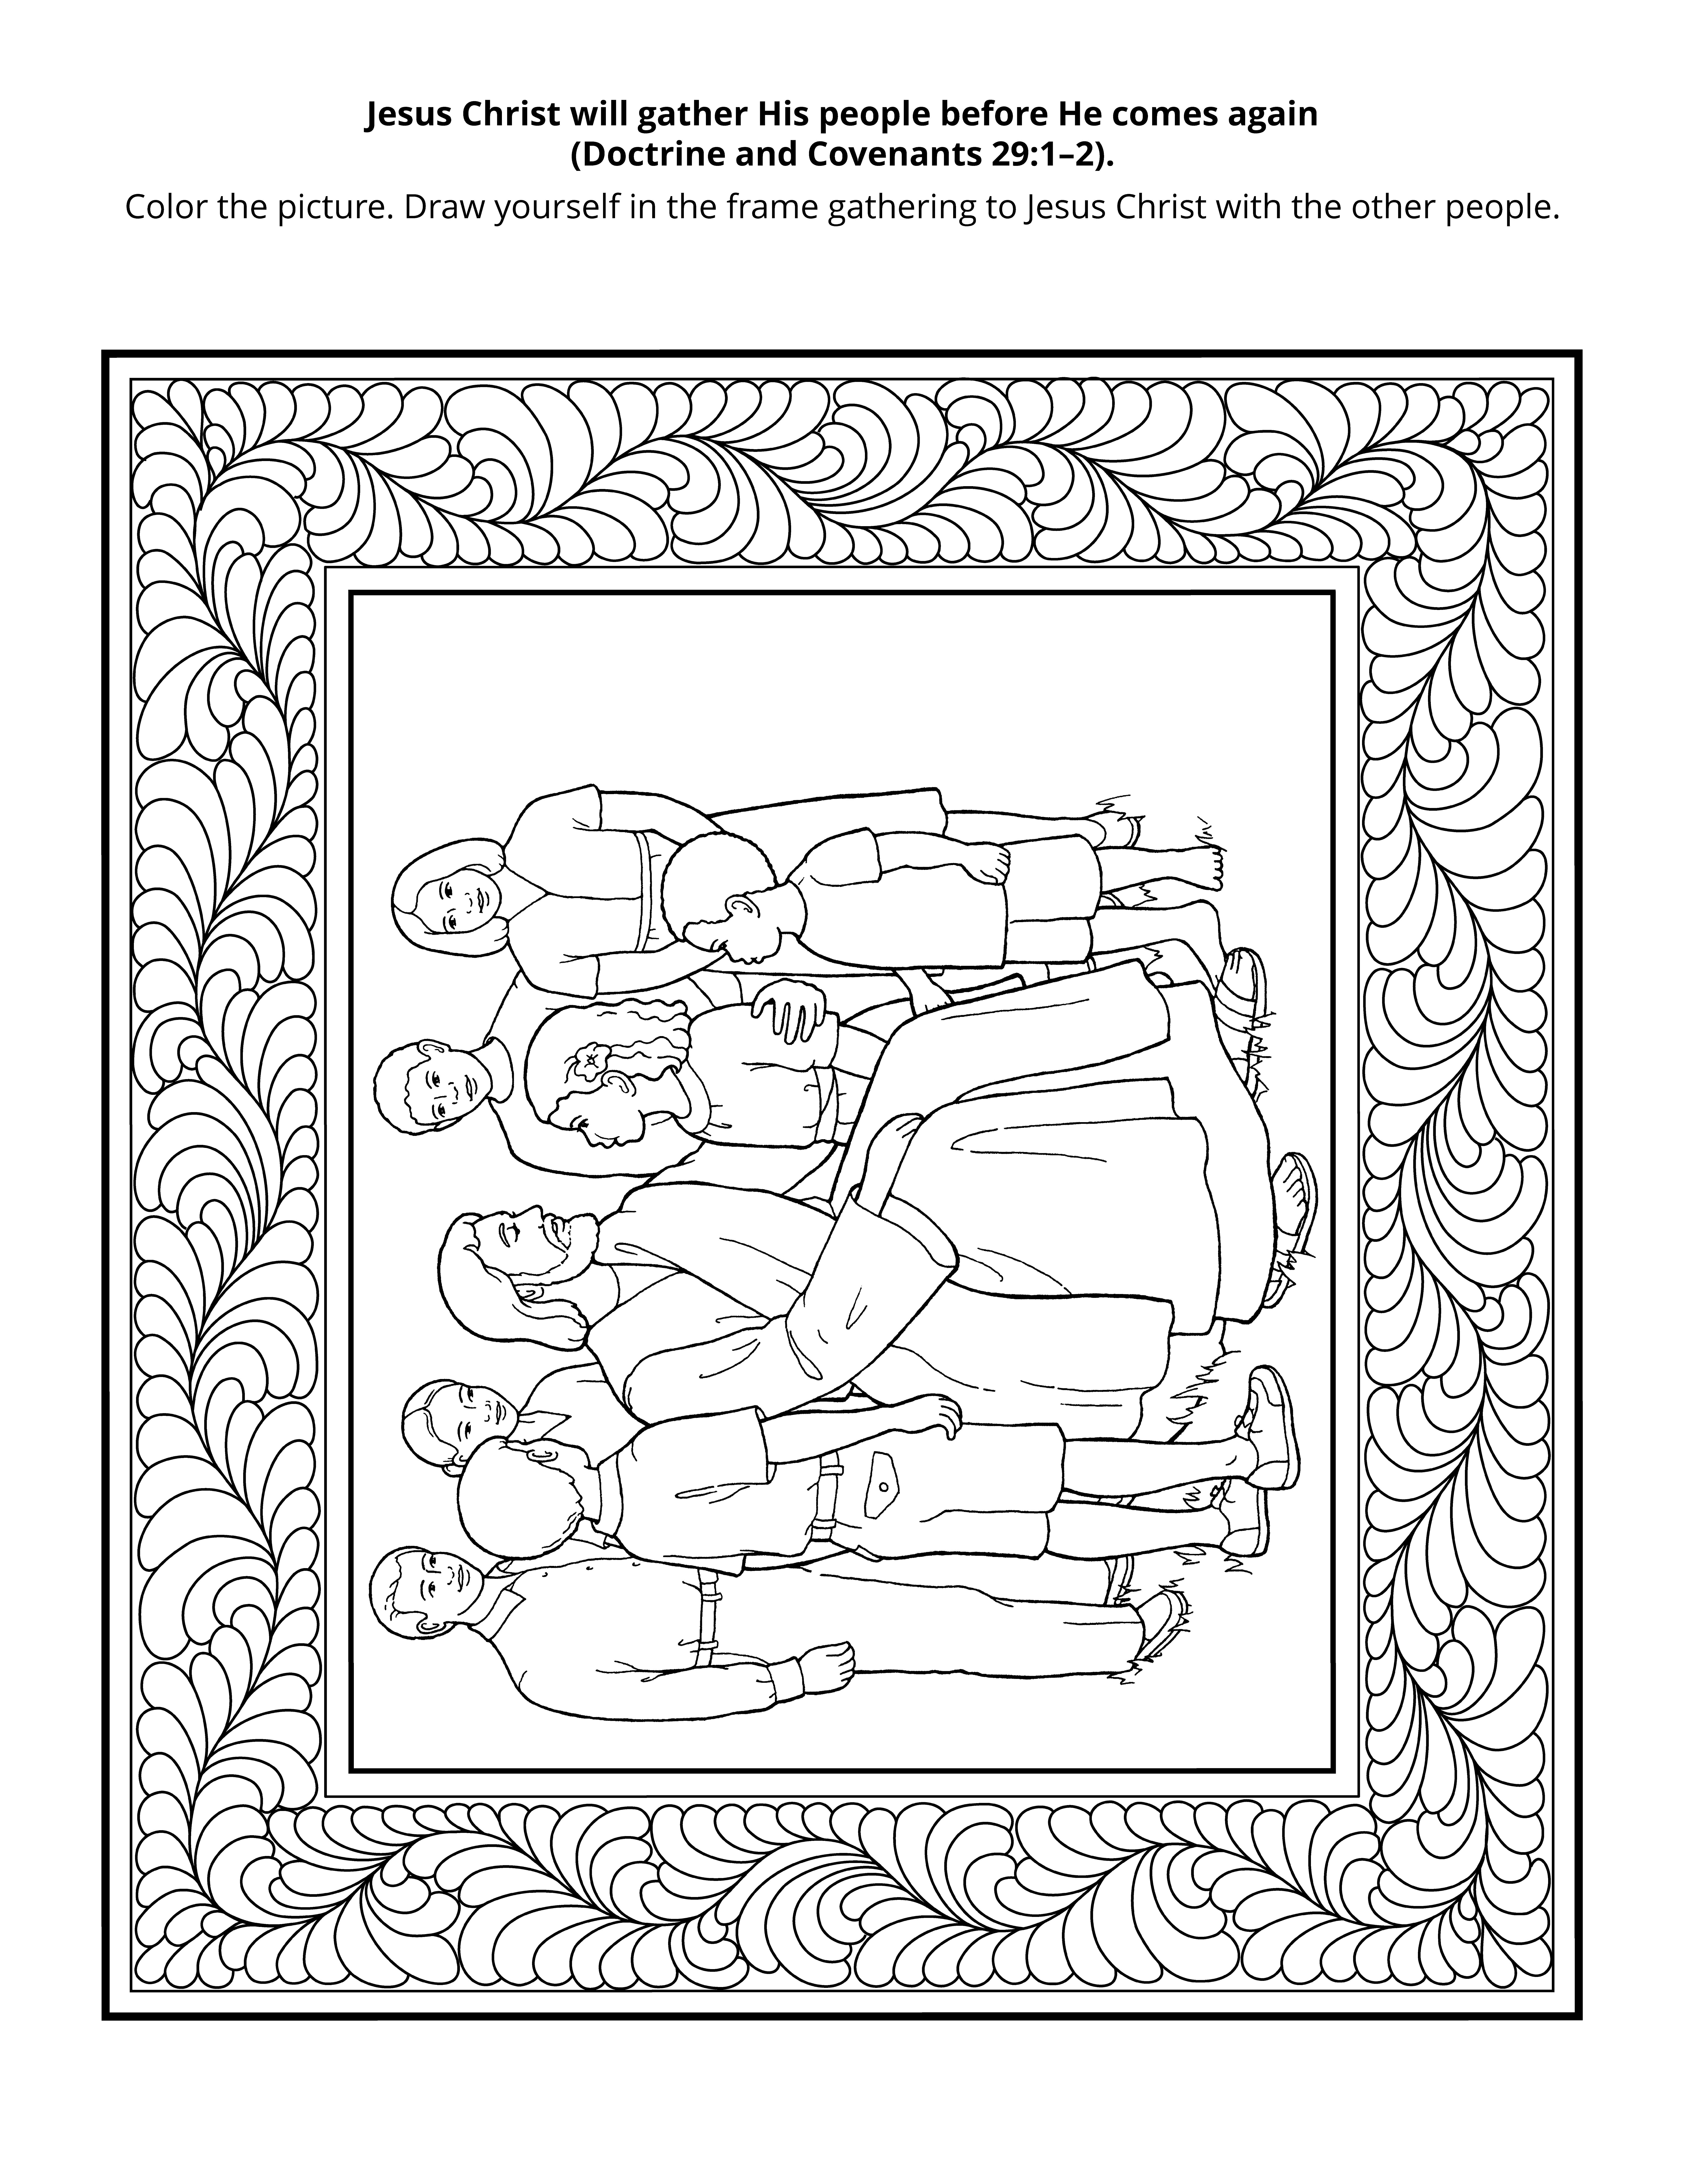 Illustration of Christ with children